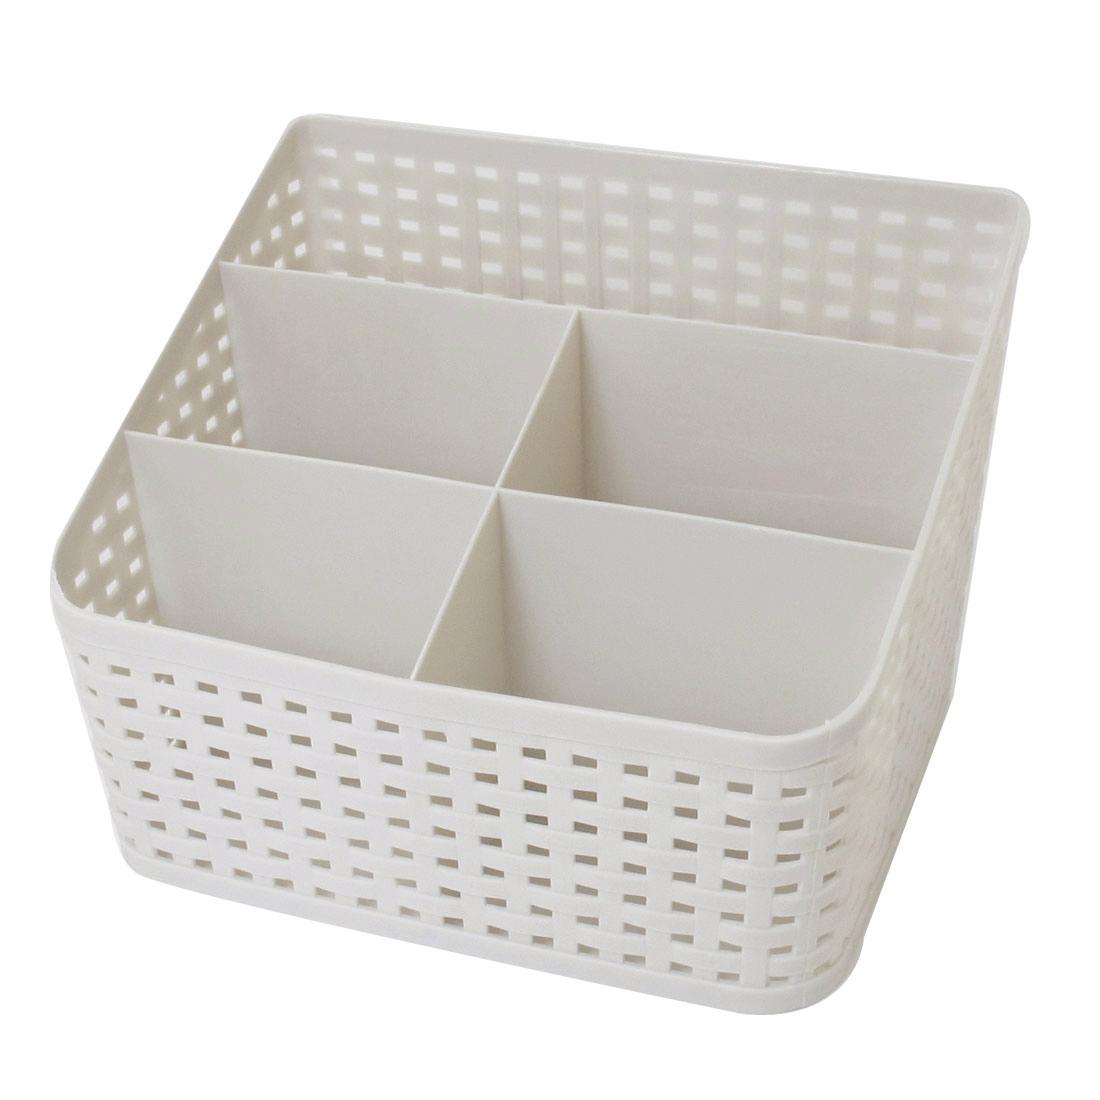 Makeup Remote Control Imitation Rattan Design Storage Drawer Basket Box Gray